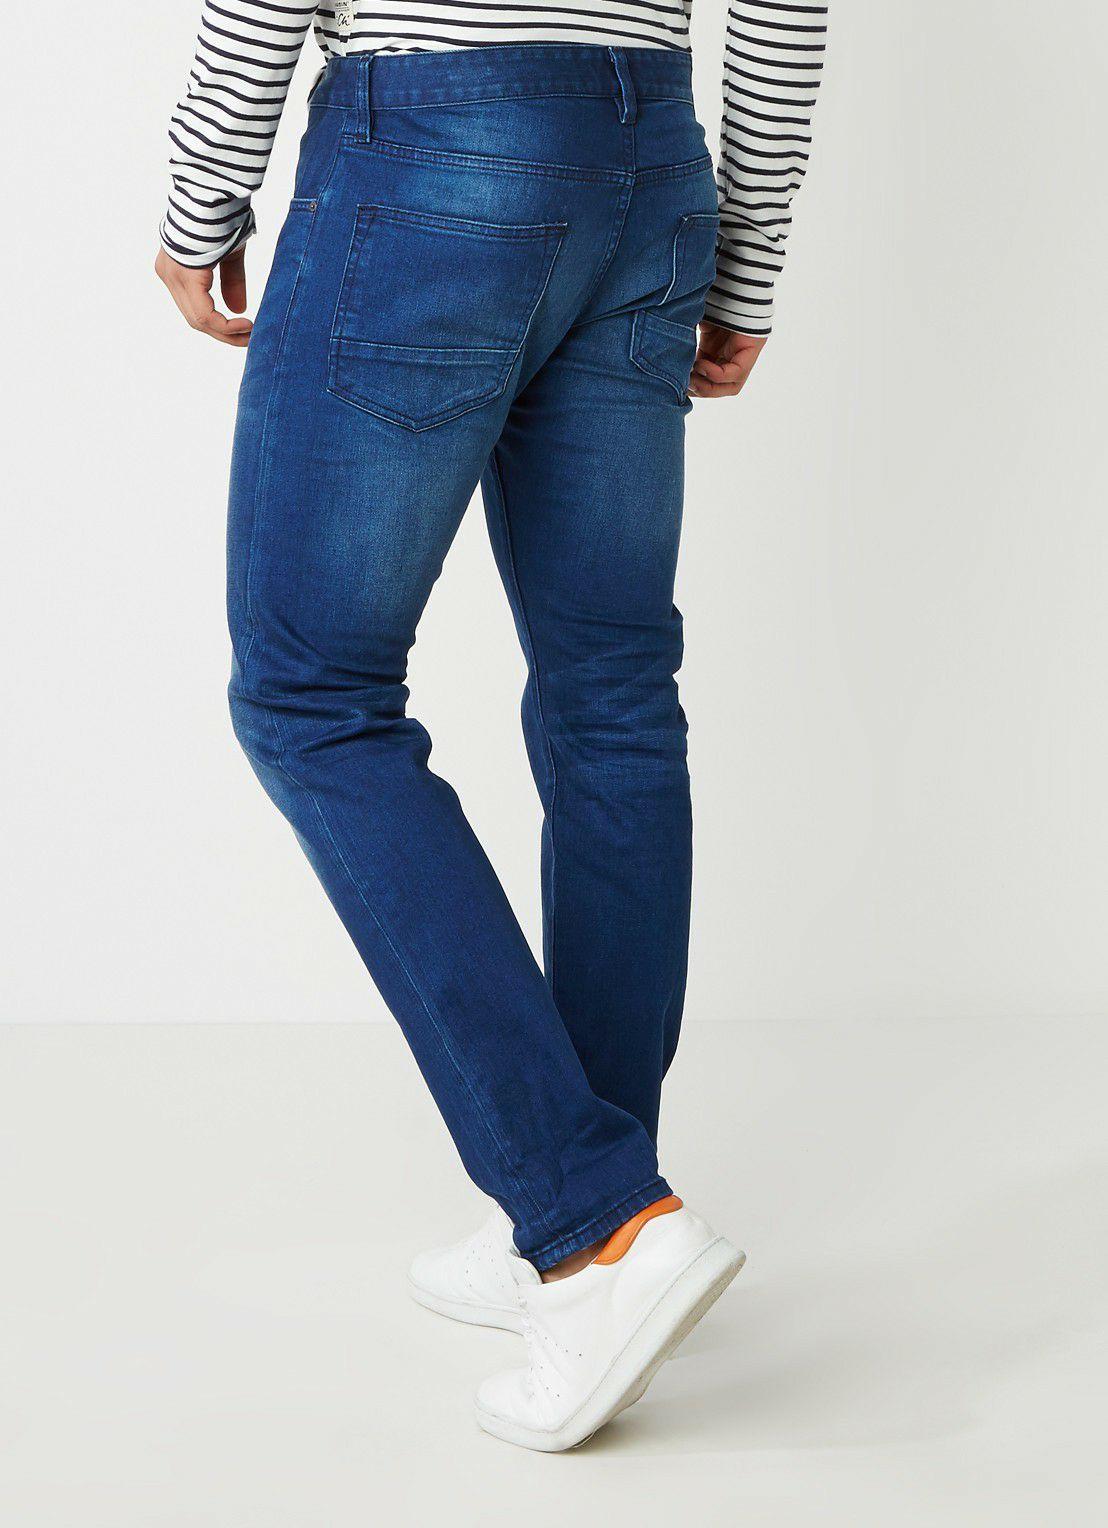 Scotch & Soda Ralston Winter Spirit Jeans (Regular Slim Fit)